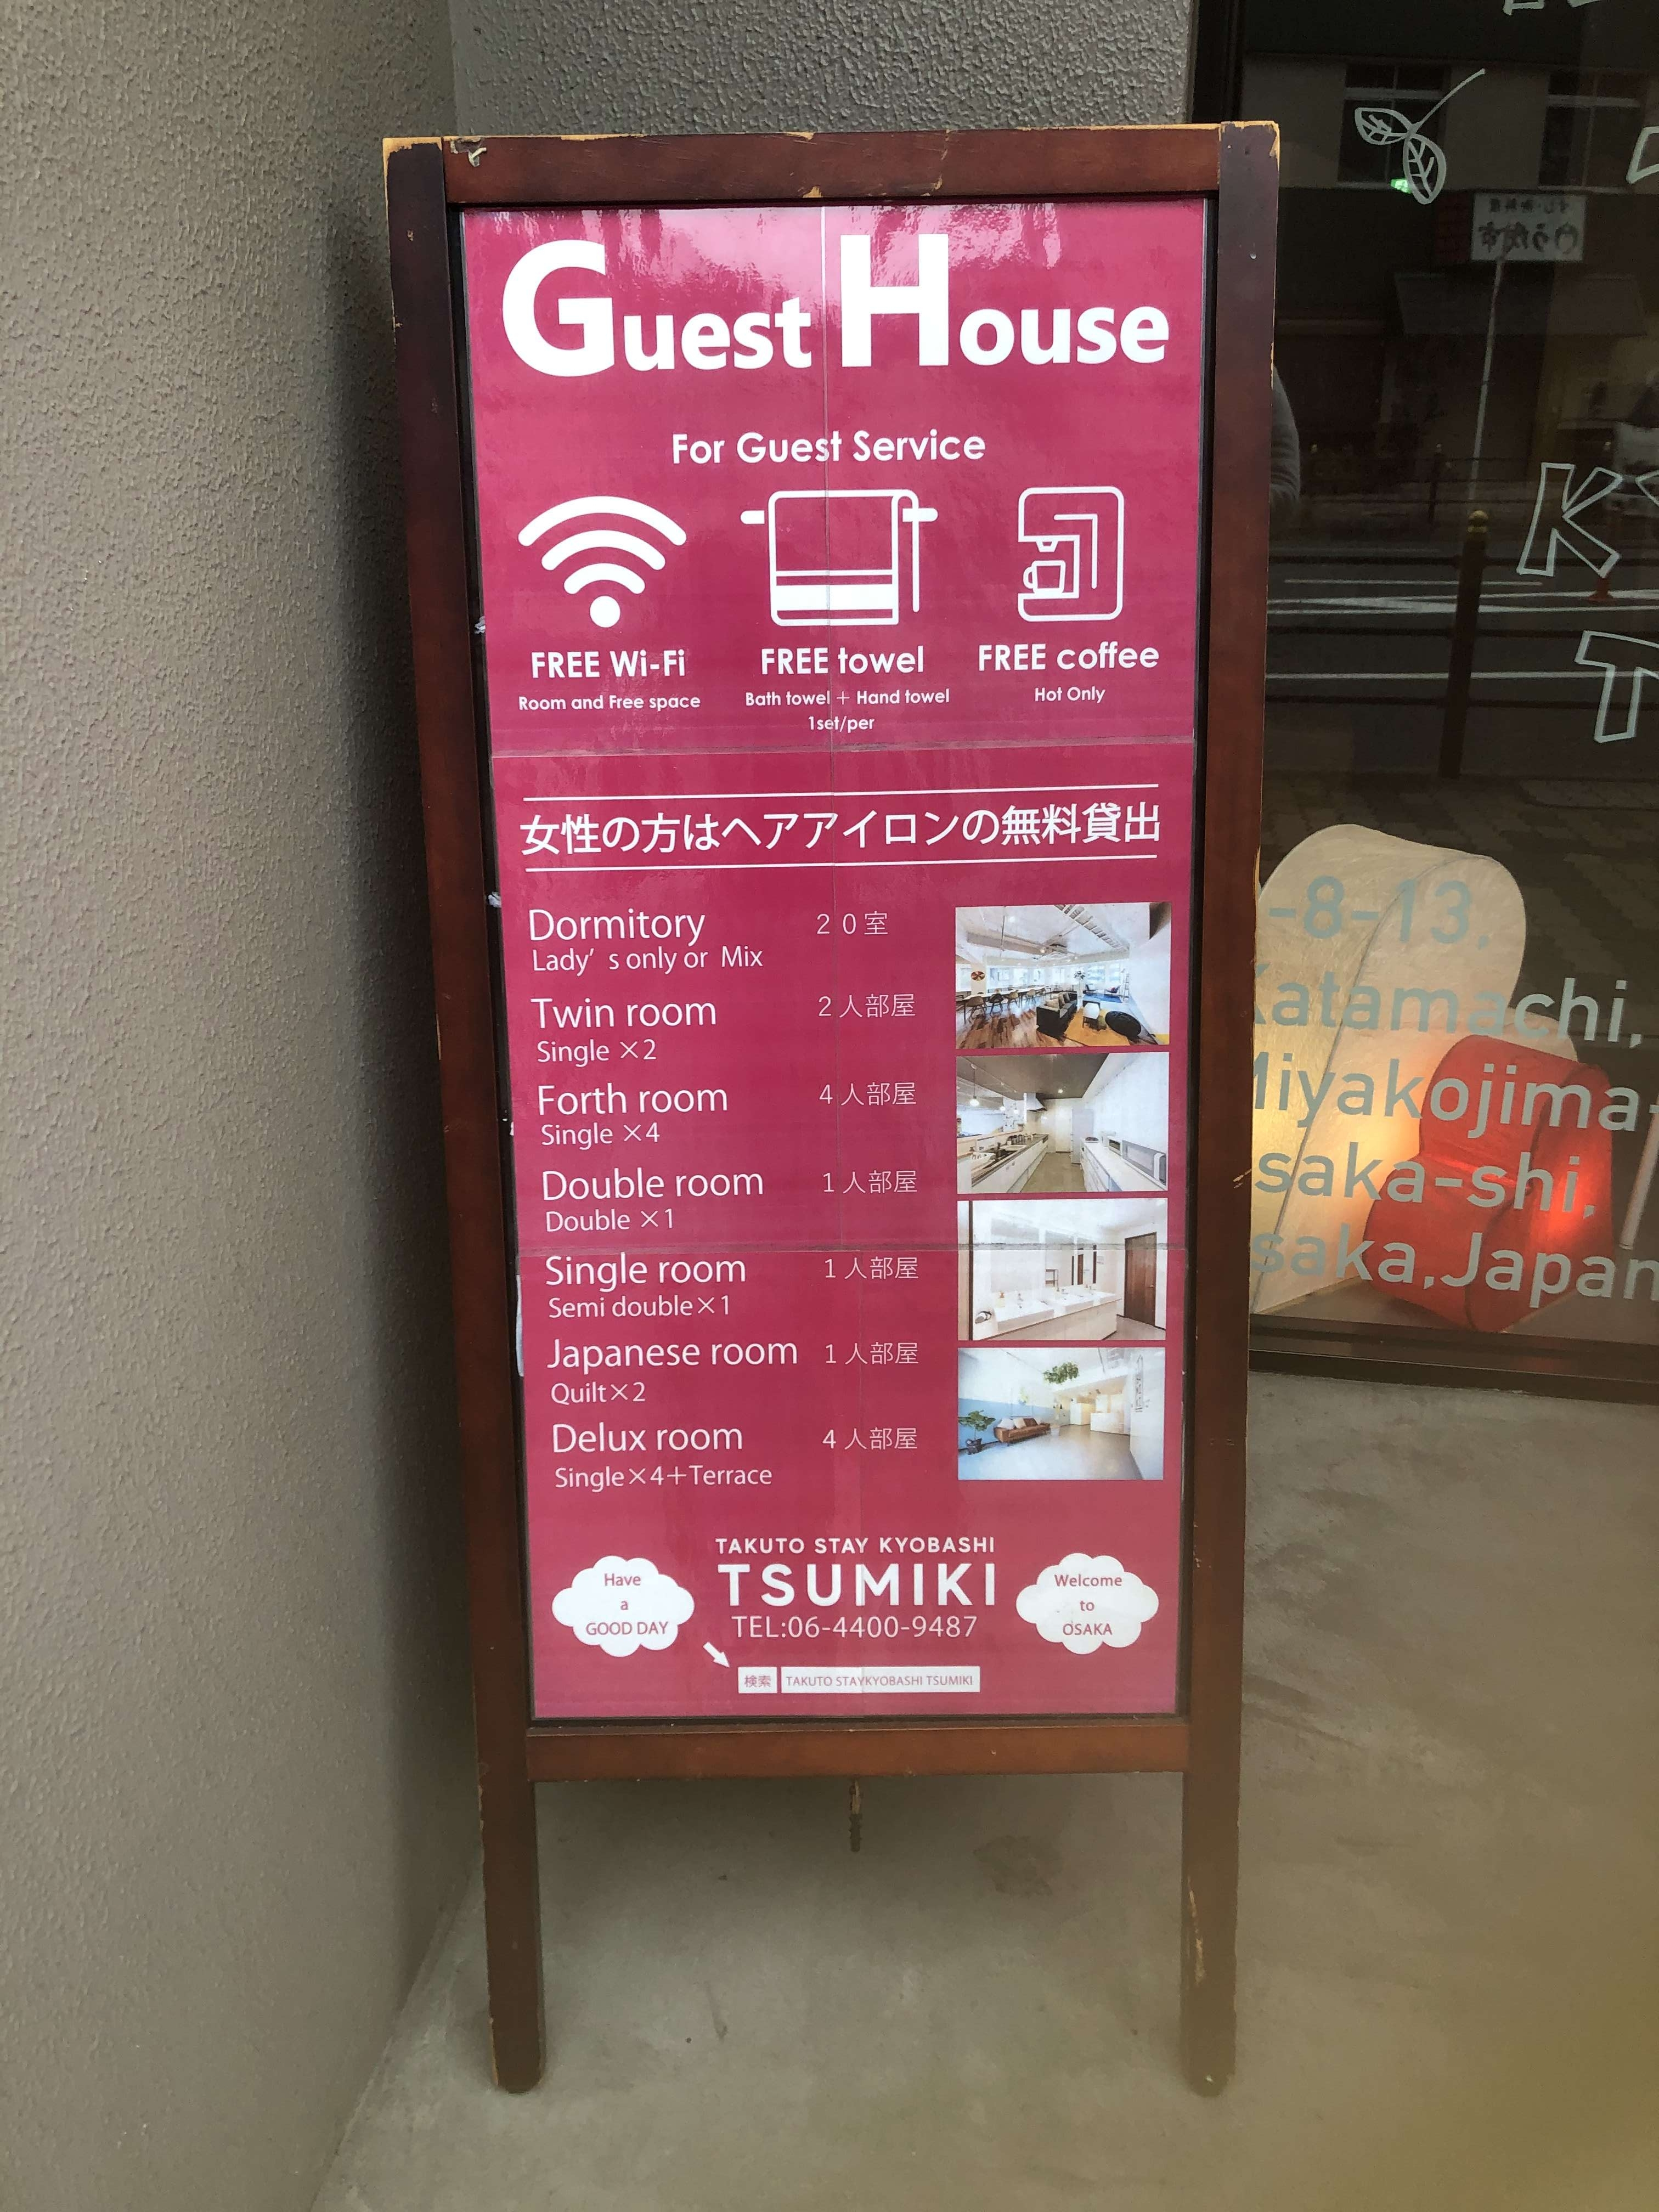 Takuto Stay Kyobashi Tsumiki ドミトリー_ホテル_案内ボード